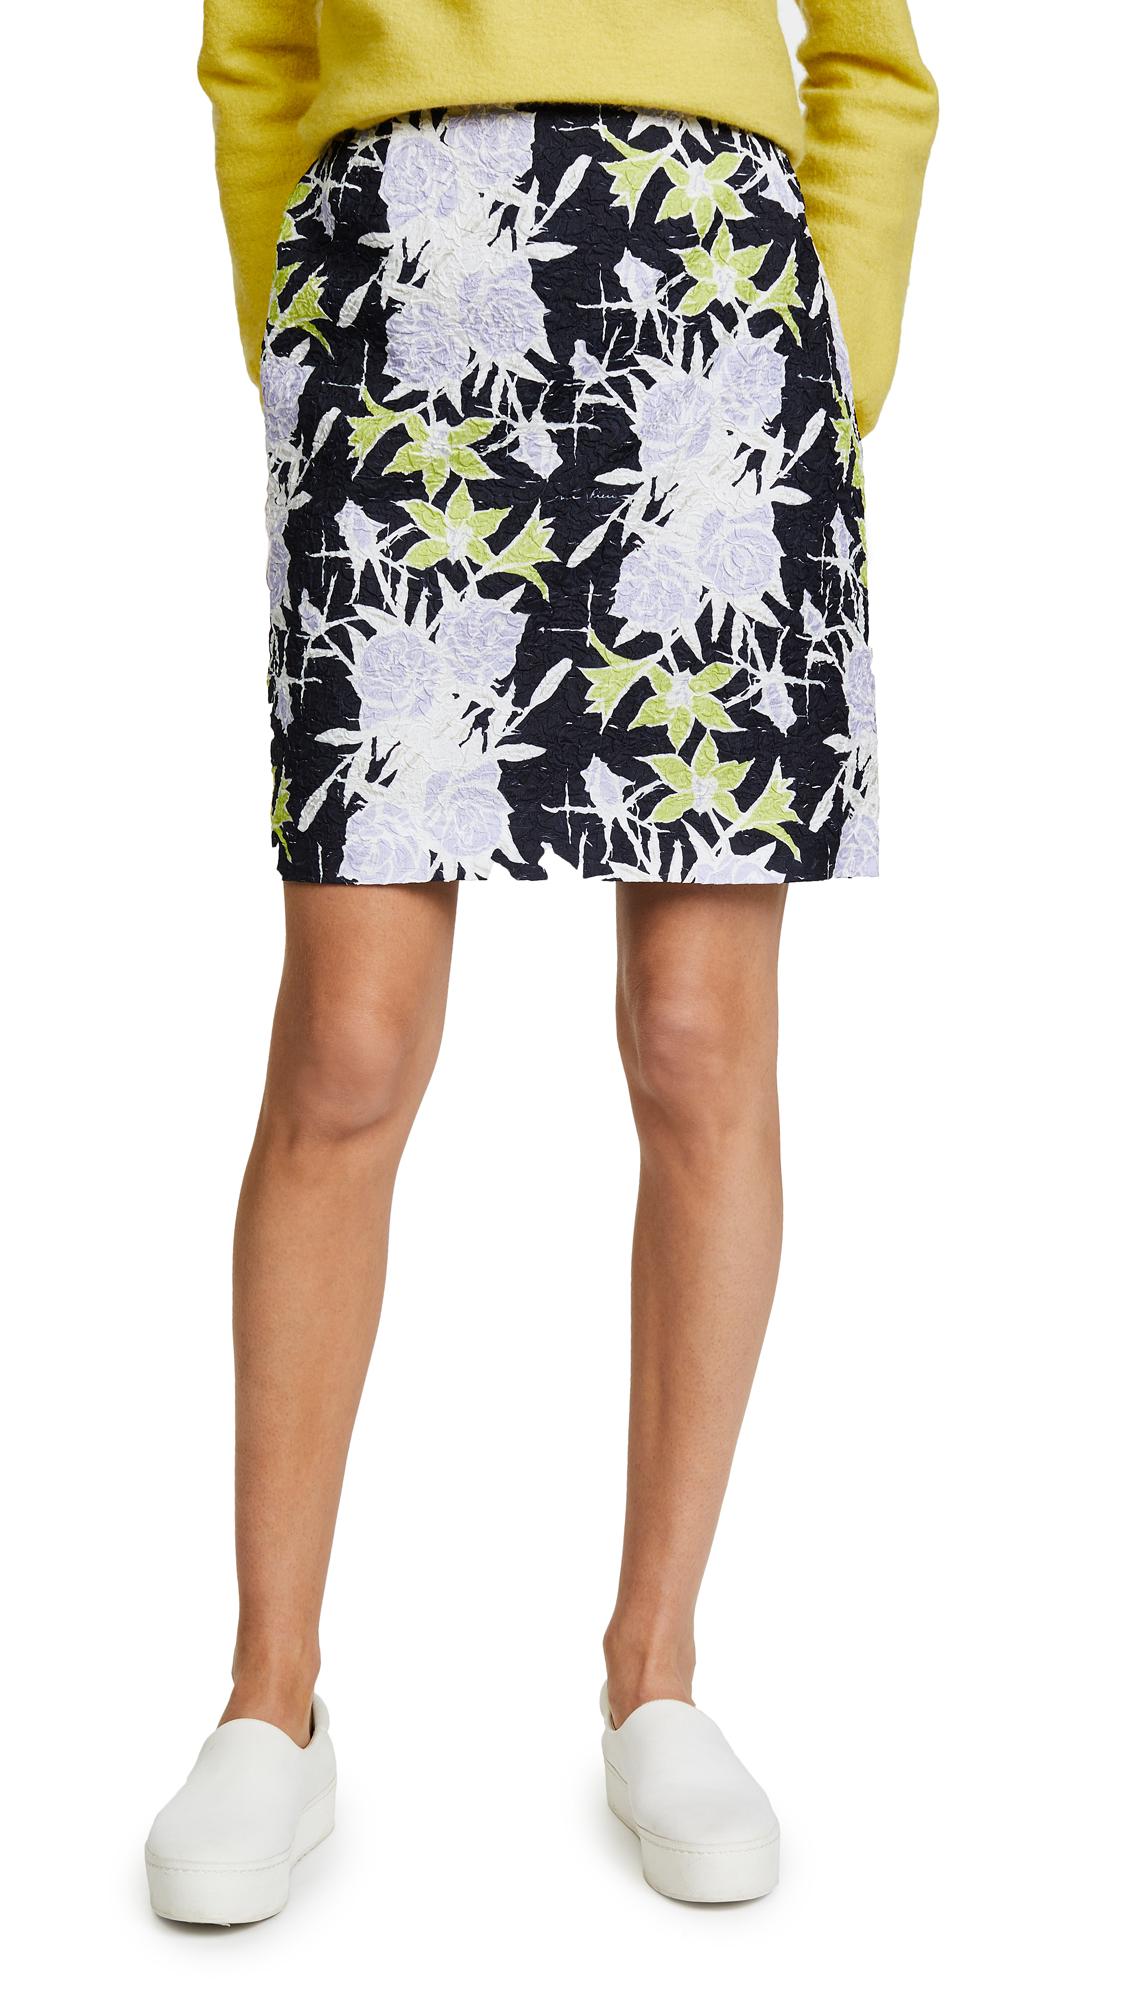 Nina Ricci Flowers Printed Waffle Skirt - Navy/Lilac